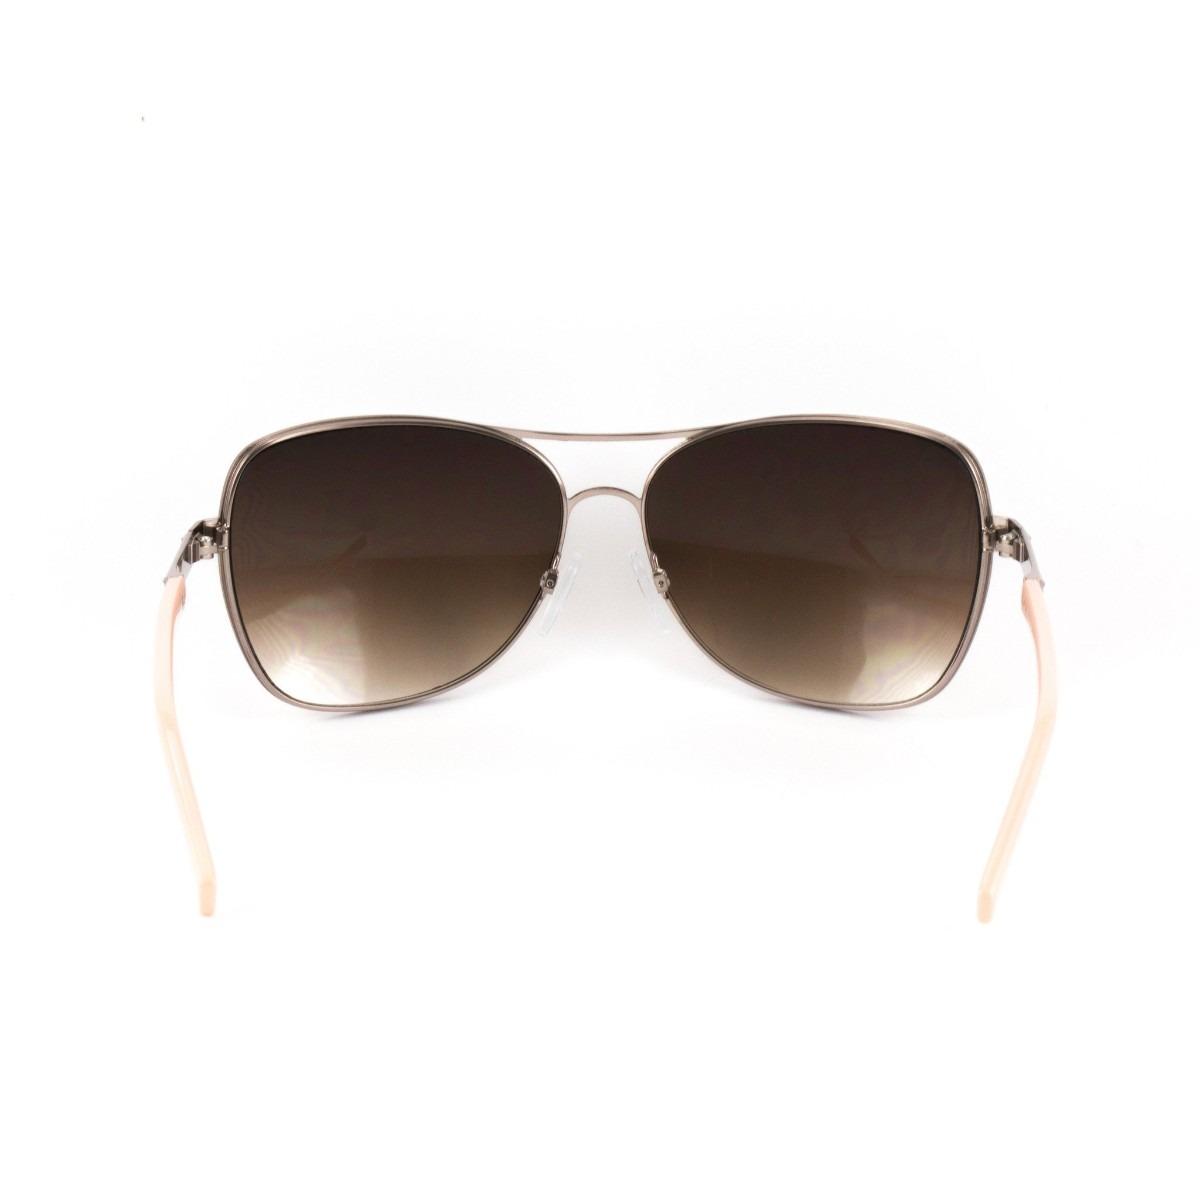 3dd88b9fb0b1b Óculos De Sol Bulget - Bg 3158 01a - R  199,00 em Mercado Livre